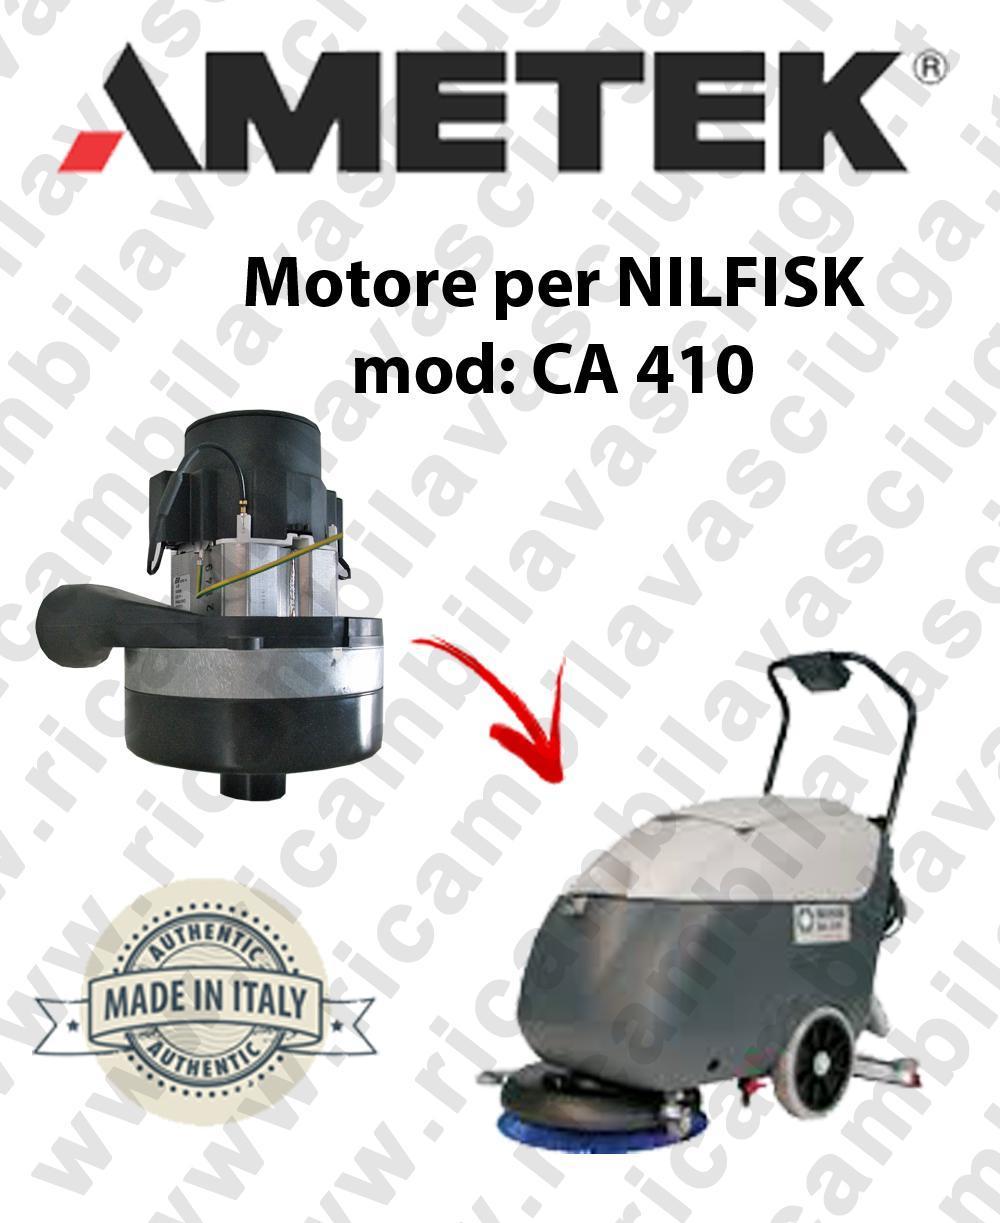 CA 410 Ametek Vacuum Motor for scrubber dryer NILFISK